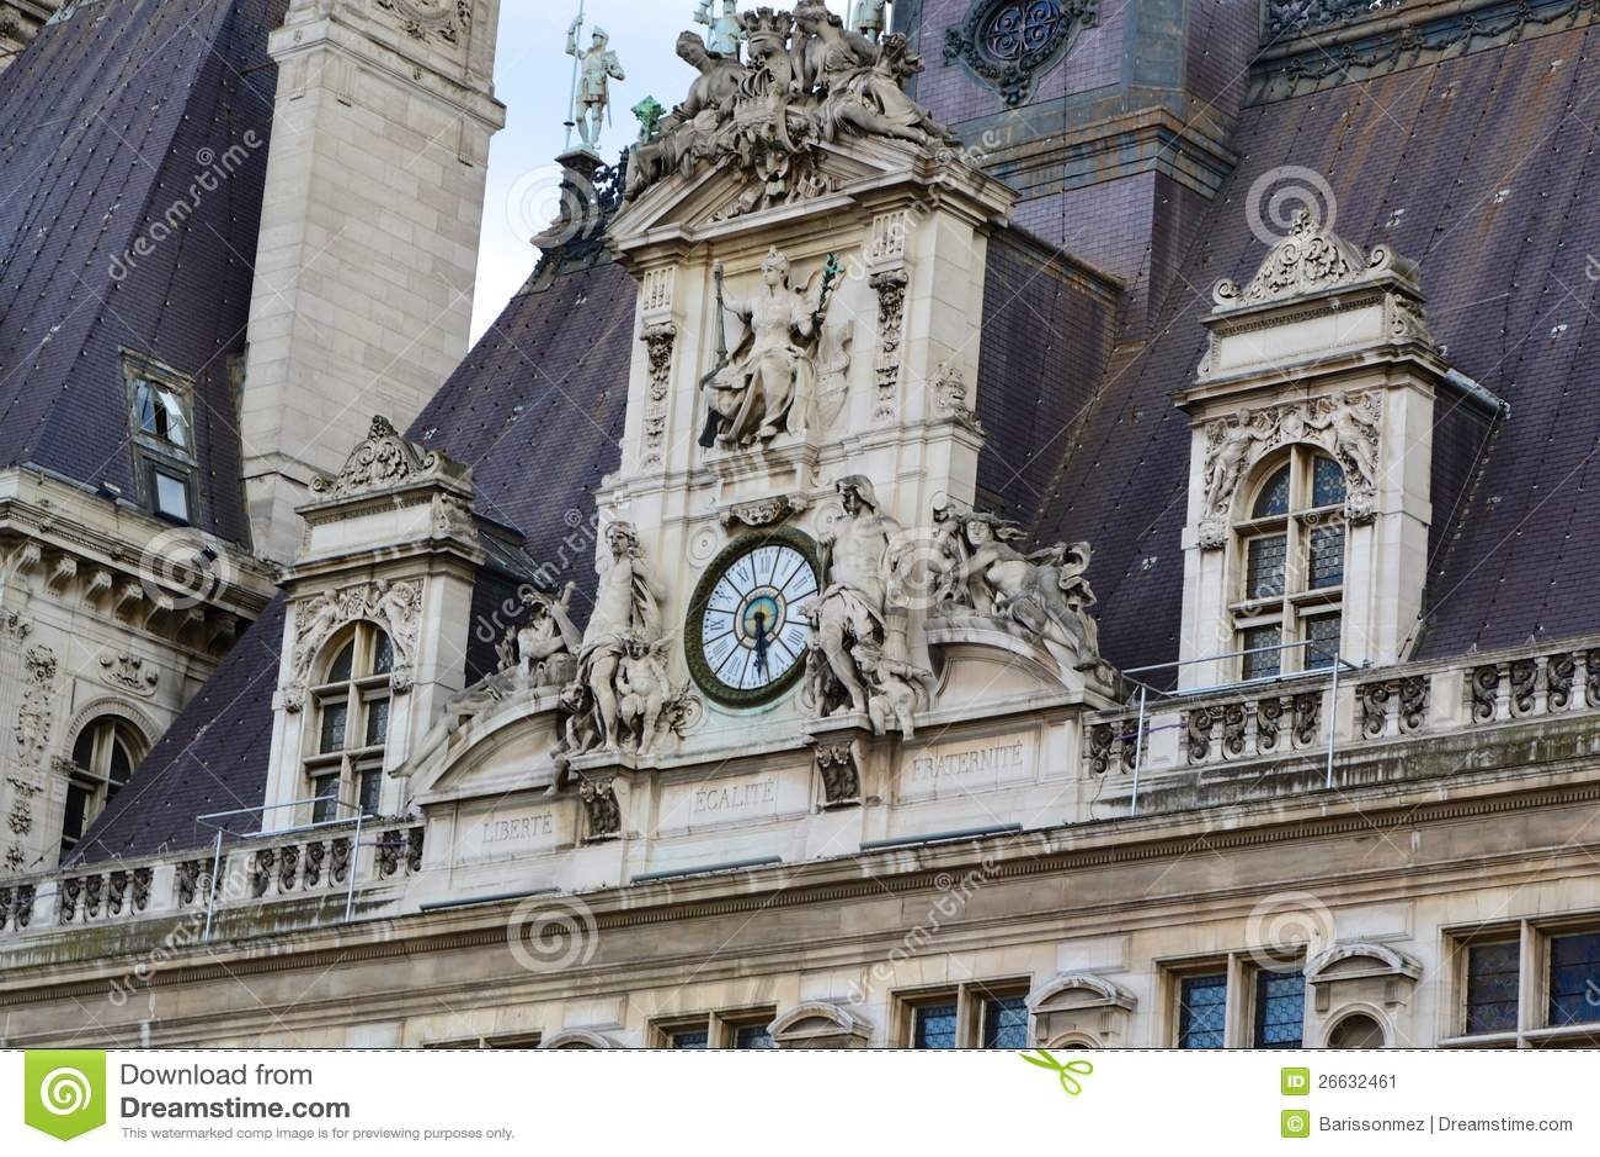 Hotel De Ville Clock Stock Image Image 26632461